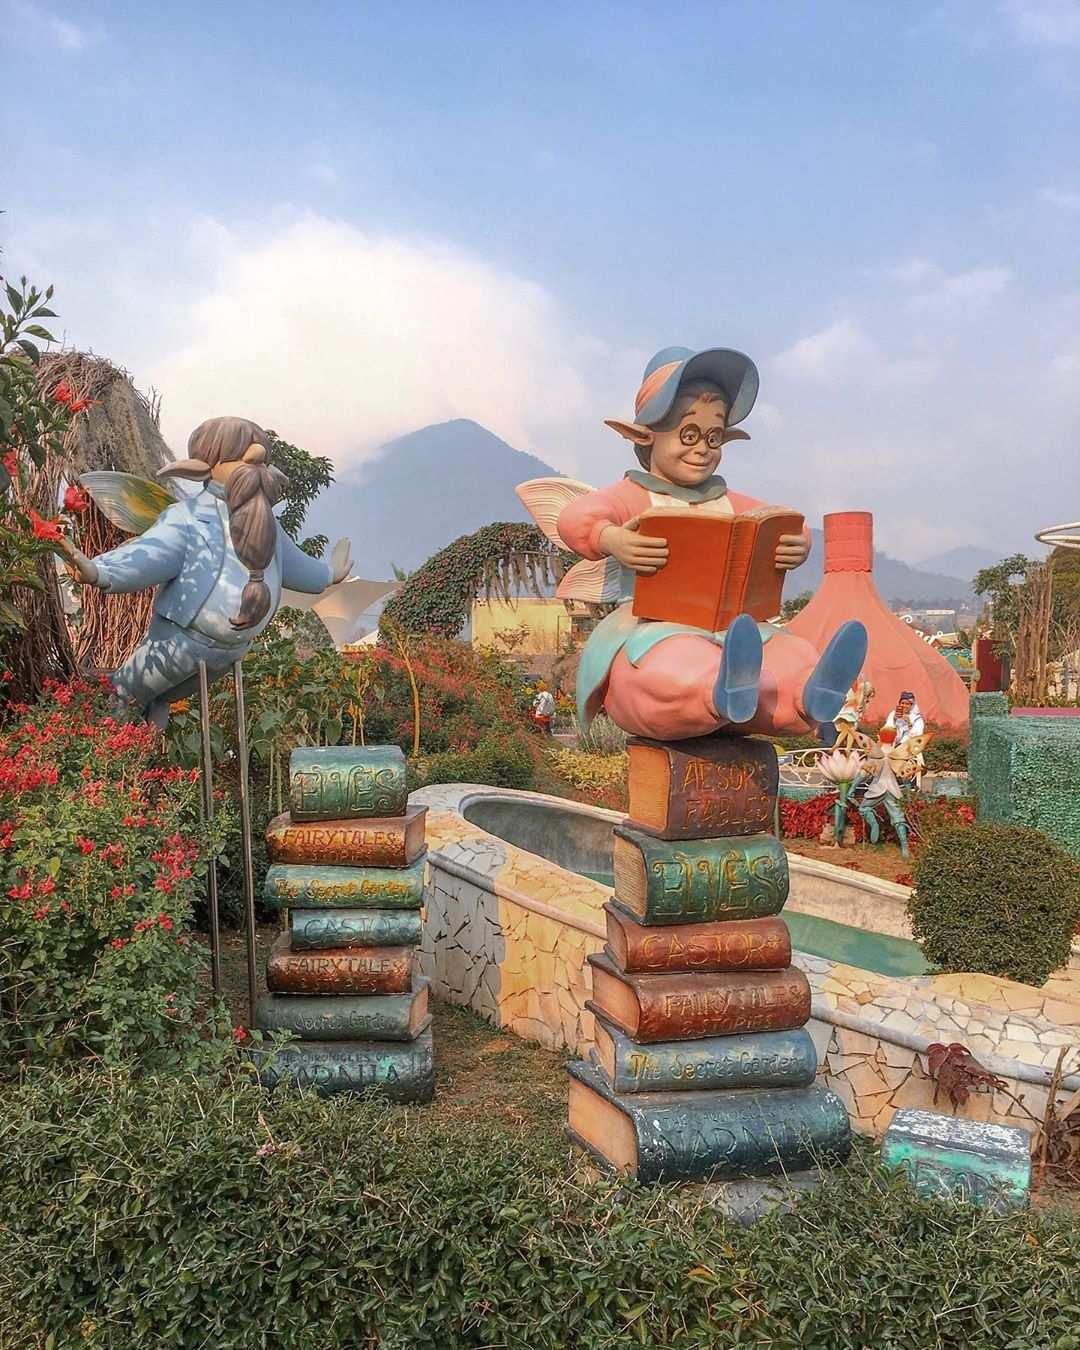 Patung-patung di Fairy Garden Bandung, Image From @_hellonovi